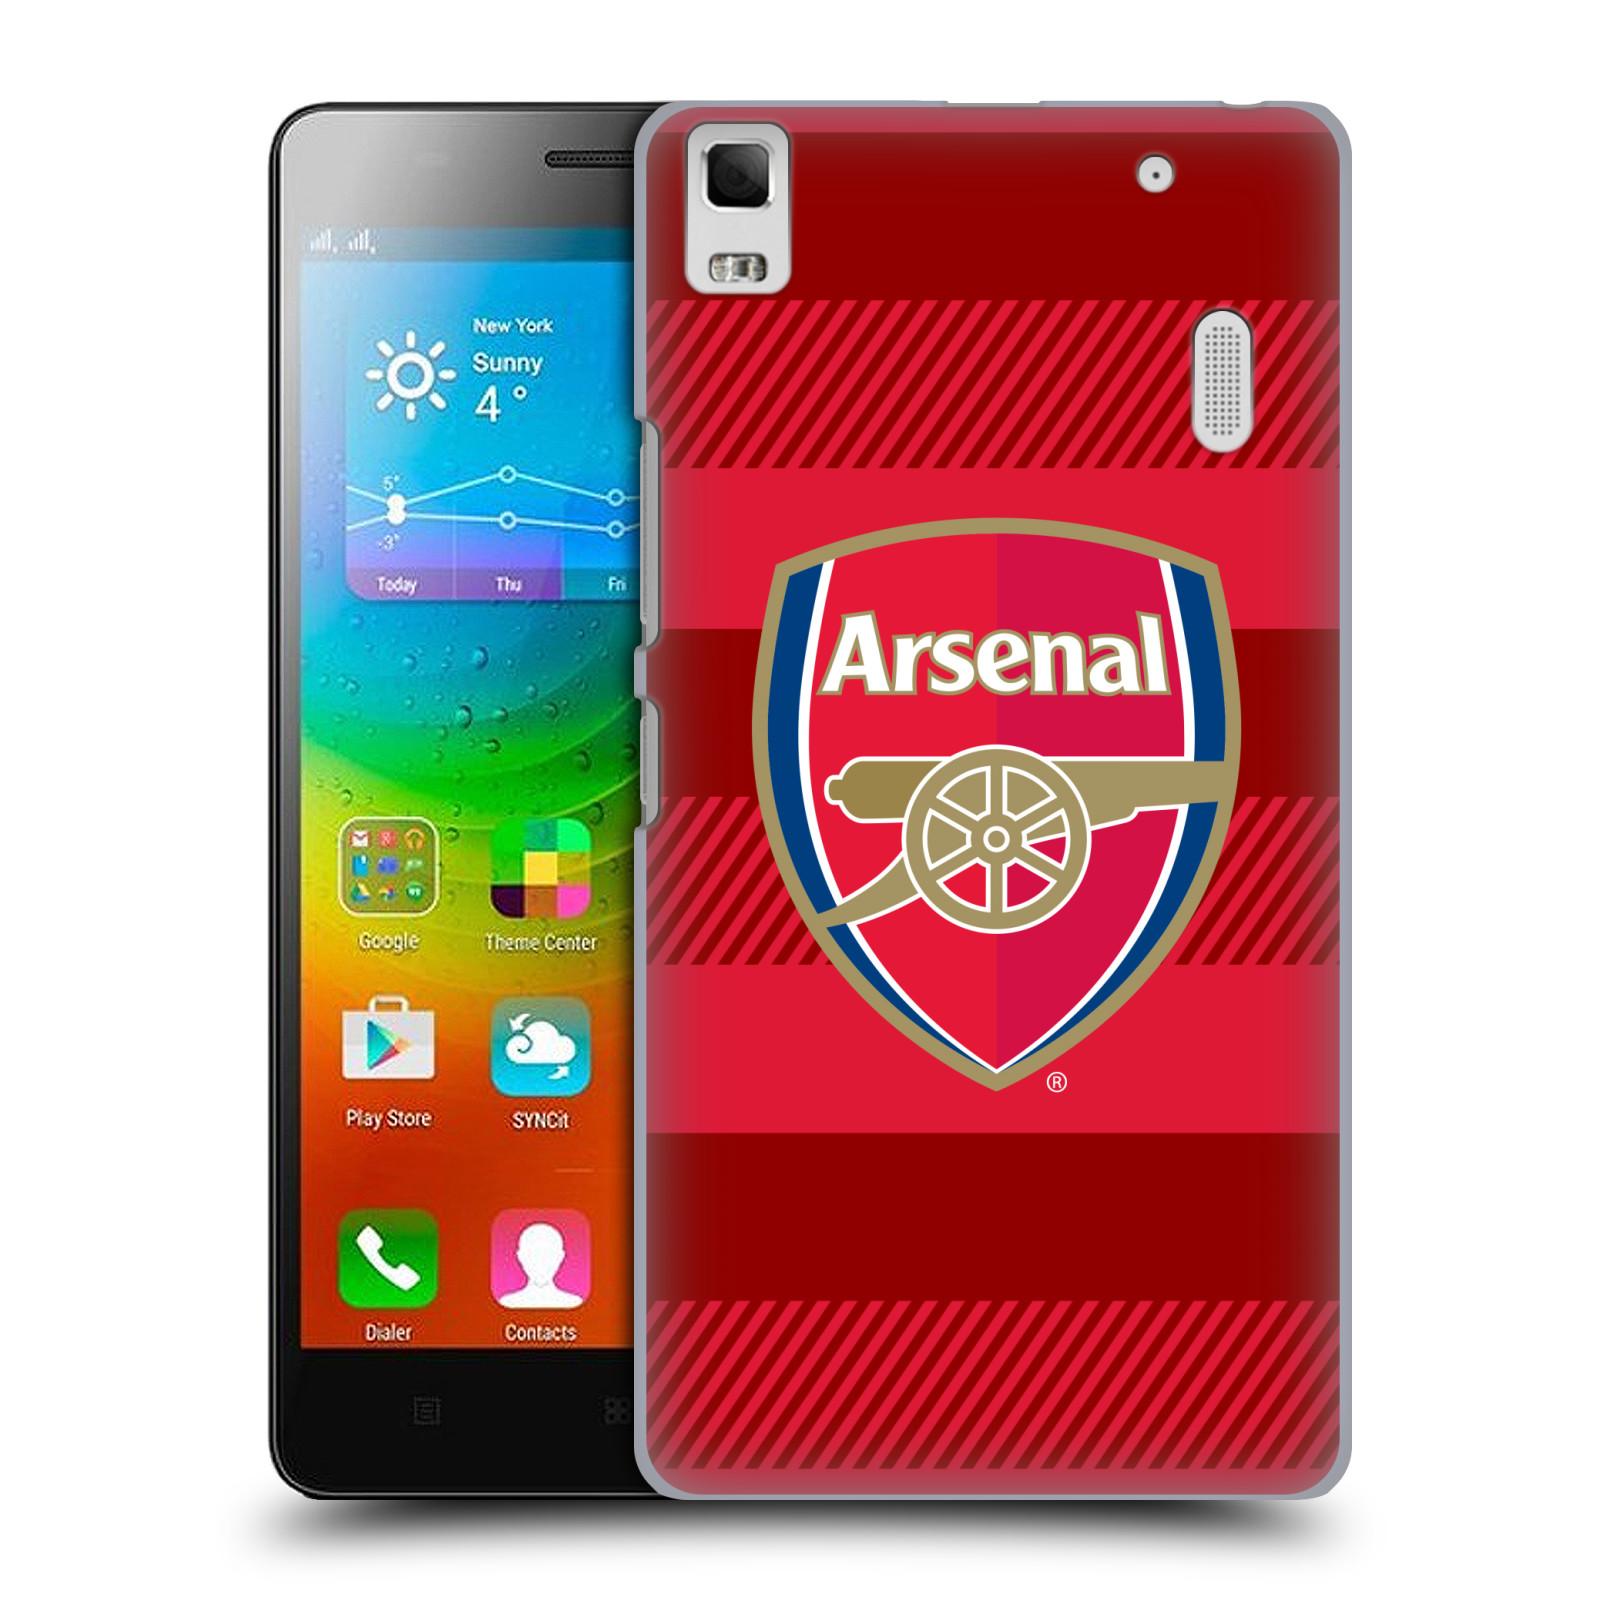 Plastové pouzdro na mobil Lenovo A7000 - Head Case - Arsenal FC - Logo s pruhy